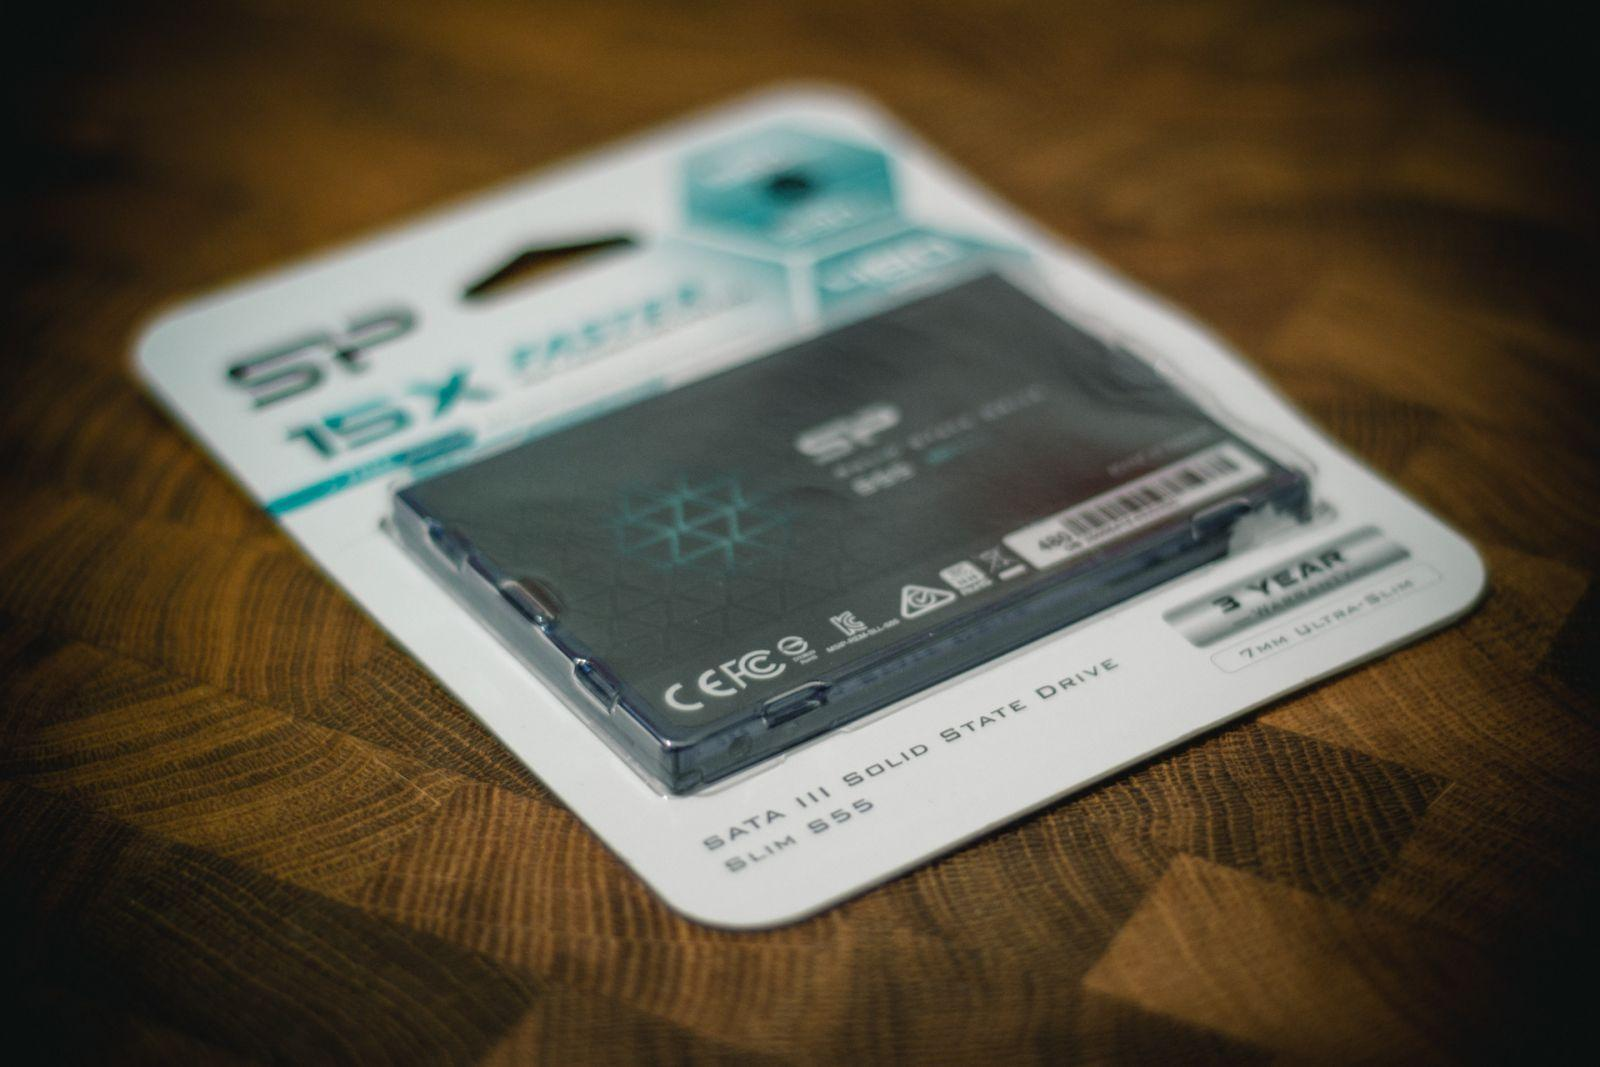 Быстро и надёжно. Обзор Silicon Power SSD Slim S55 (dsc 8729)